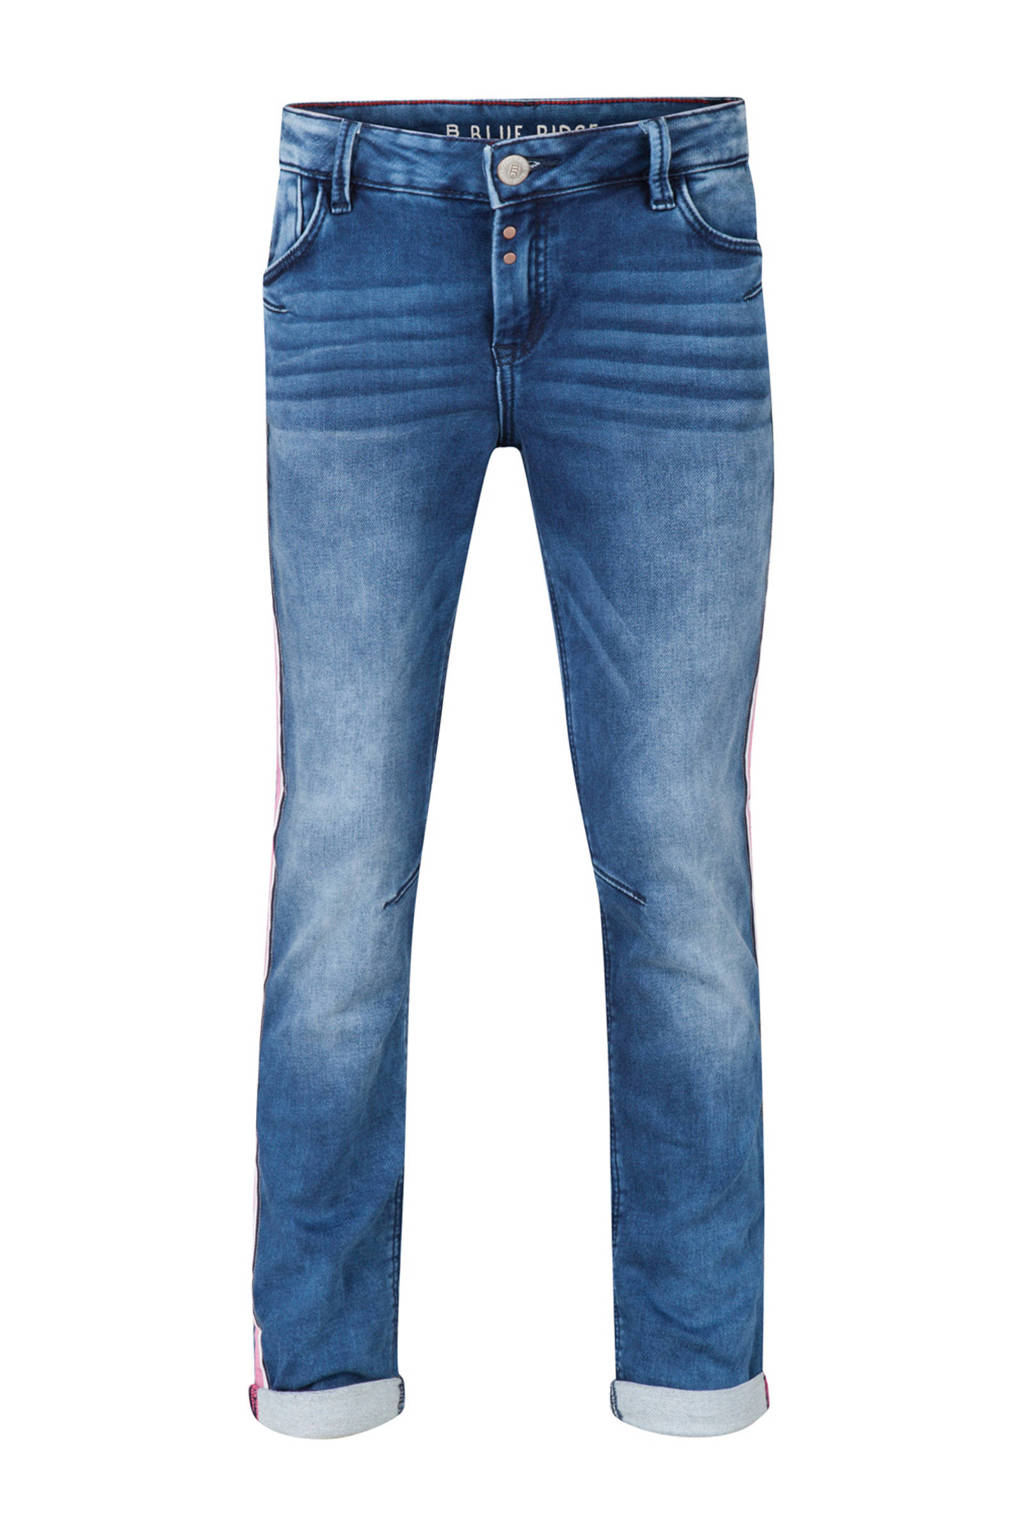 WE Fashion Blue Ridge boyfriend jeans Megan Sammy, Stonewashed